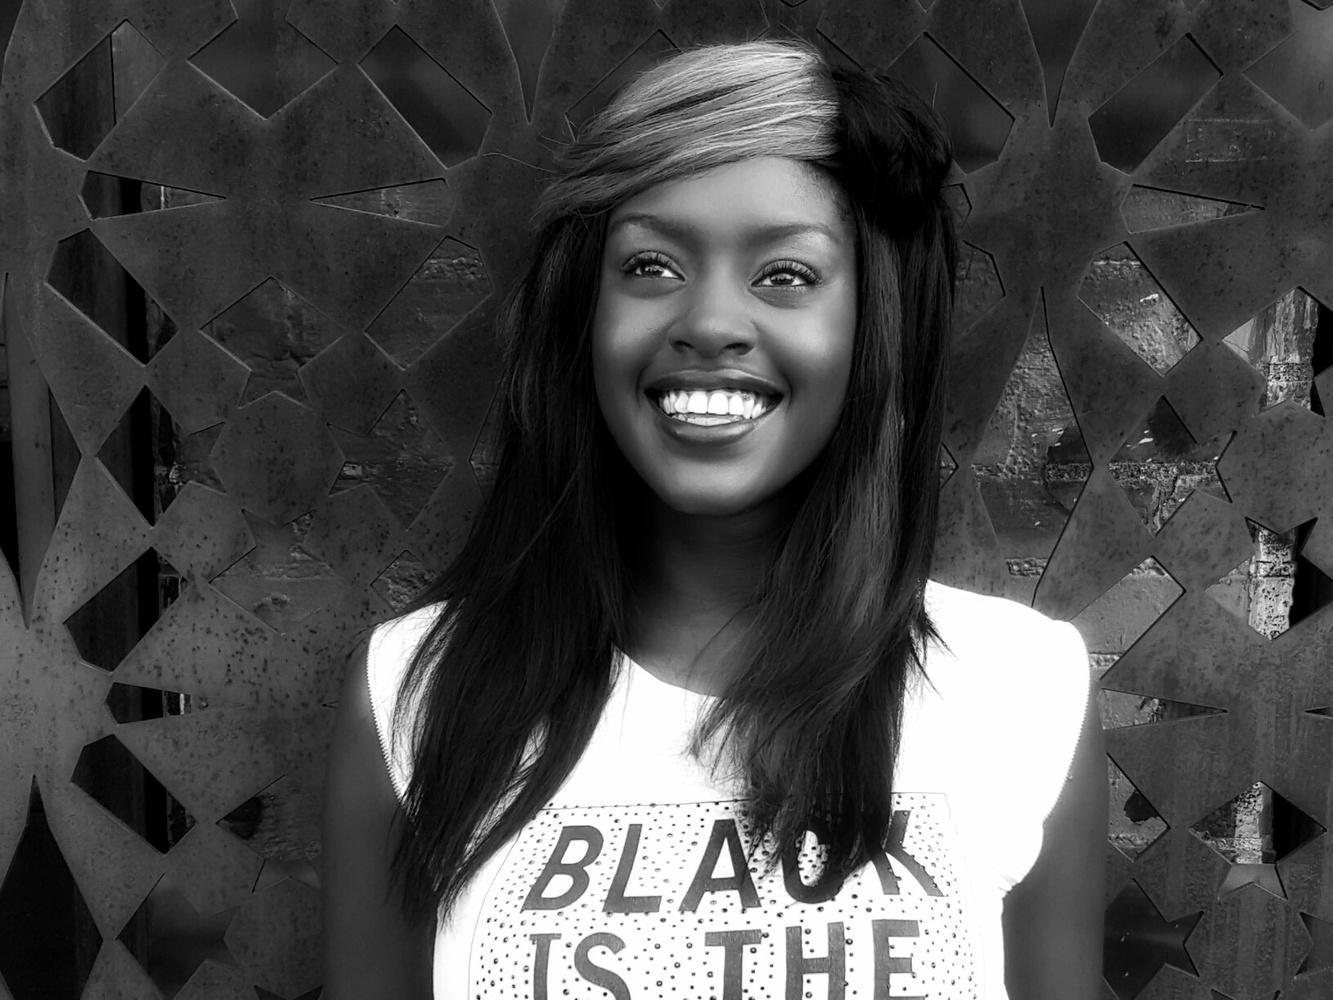 The New Black by chanda hopkins